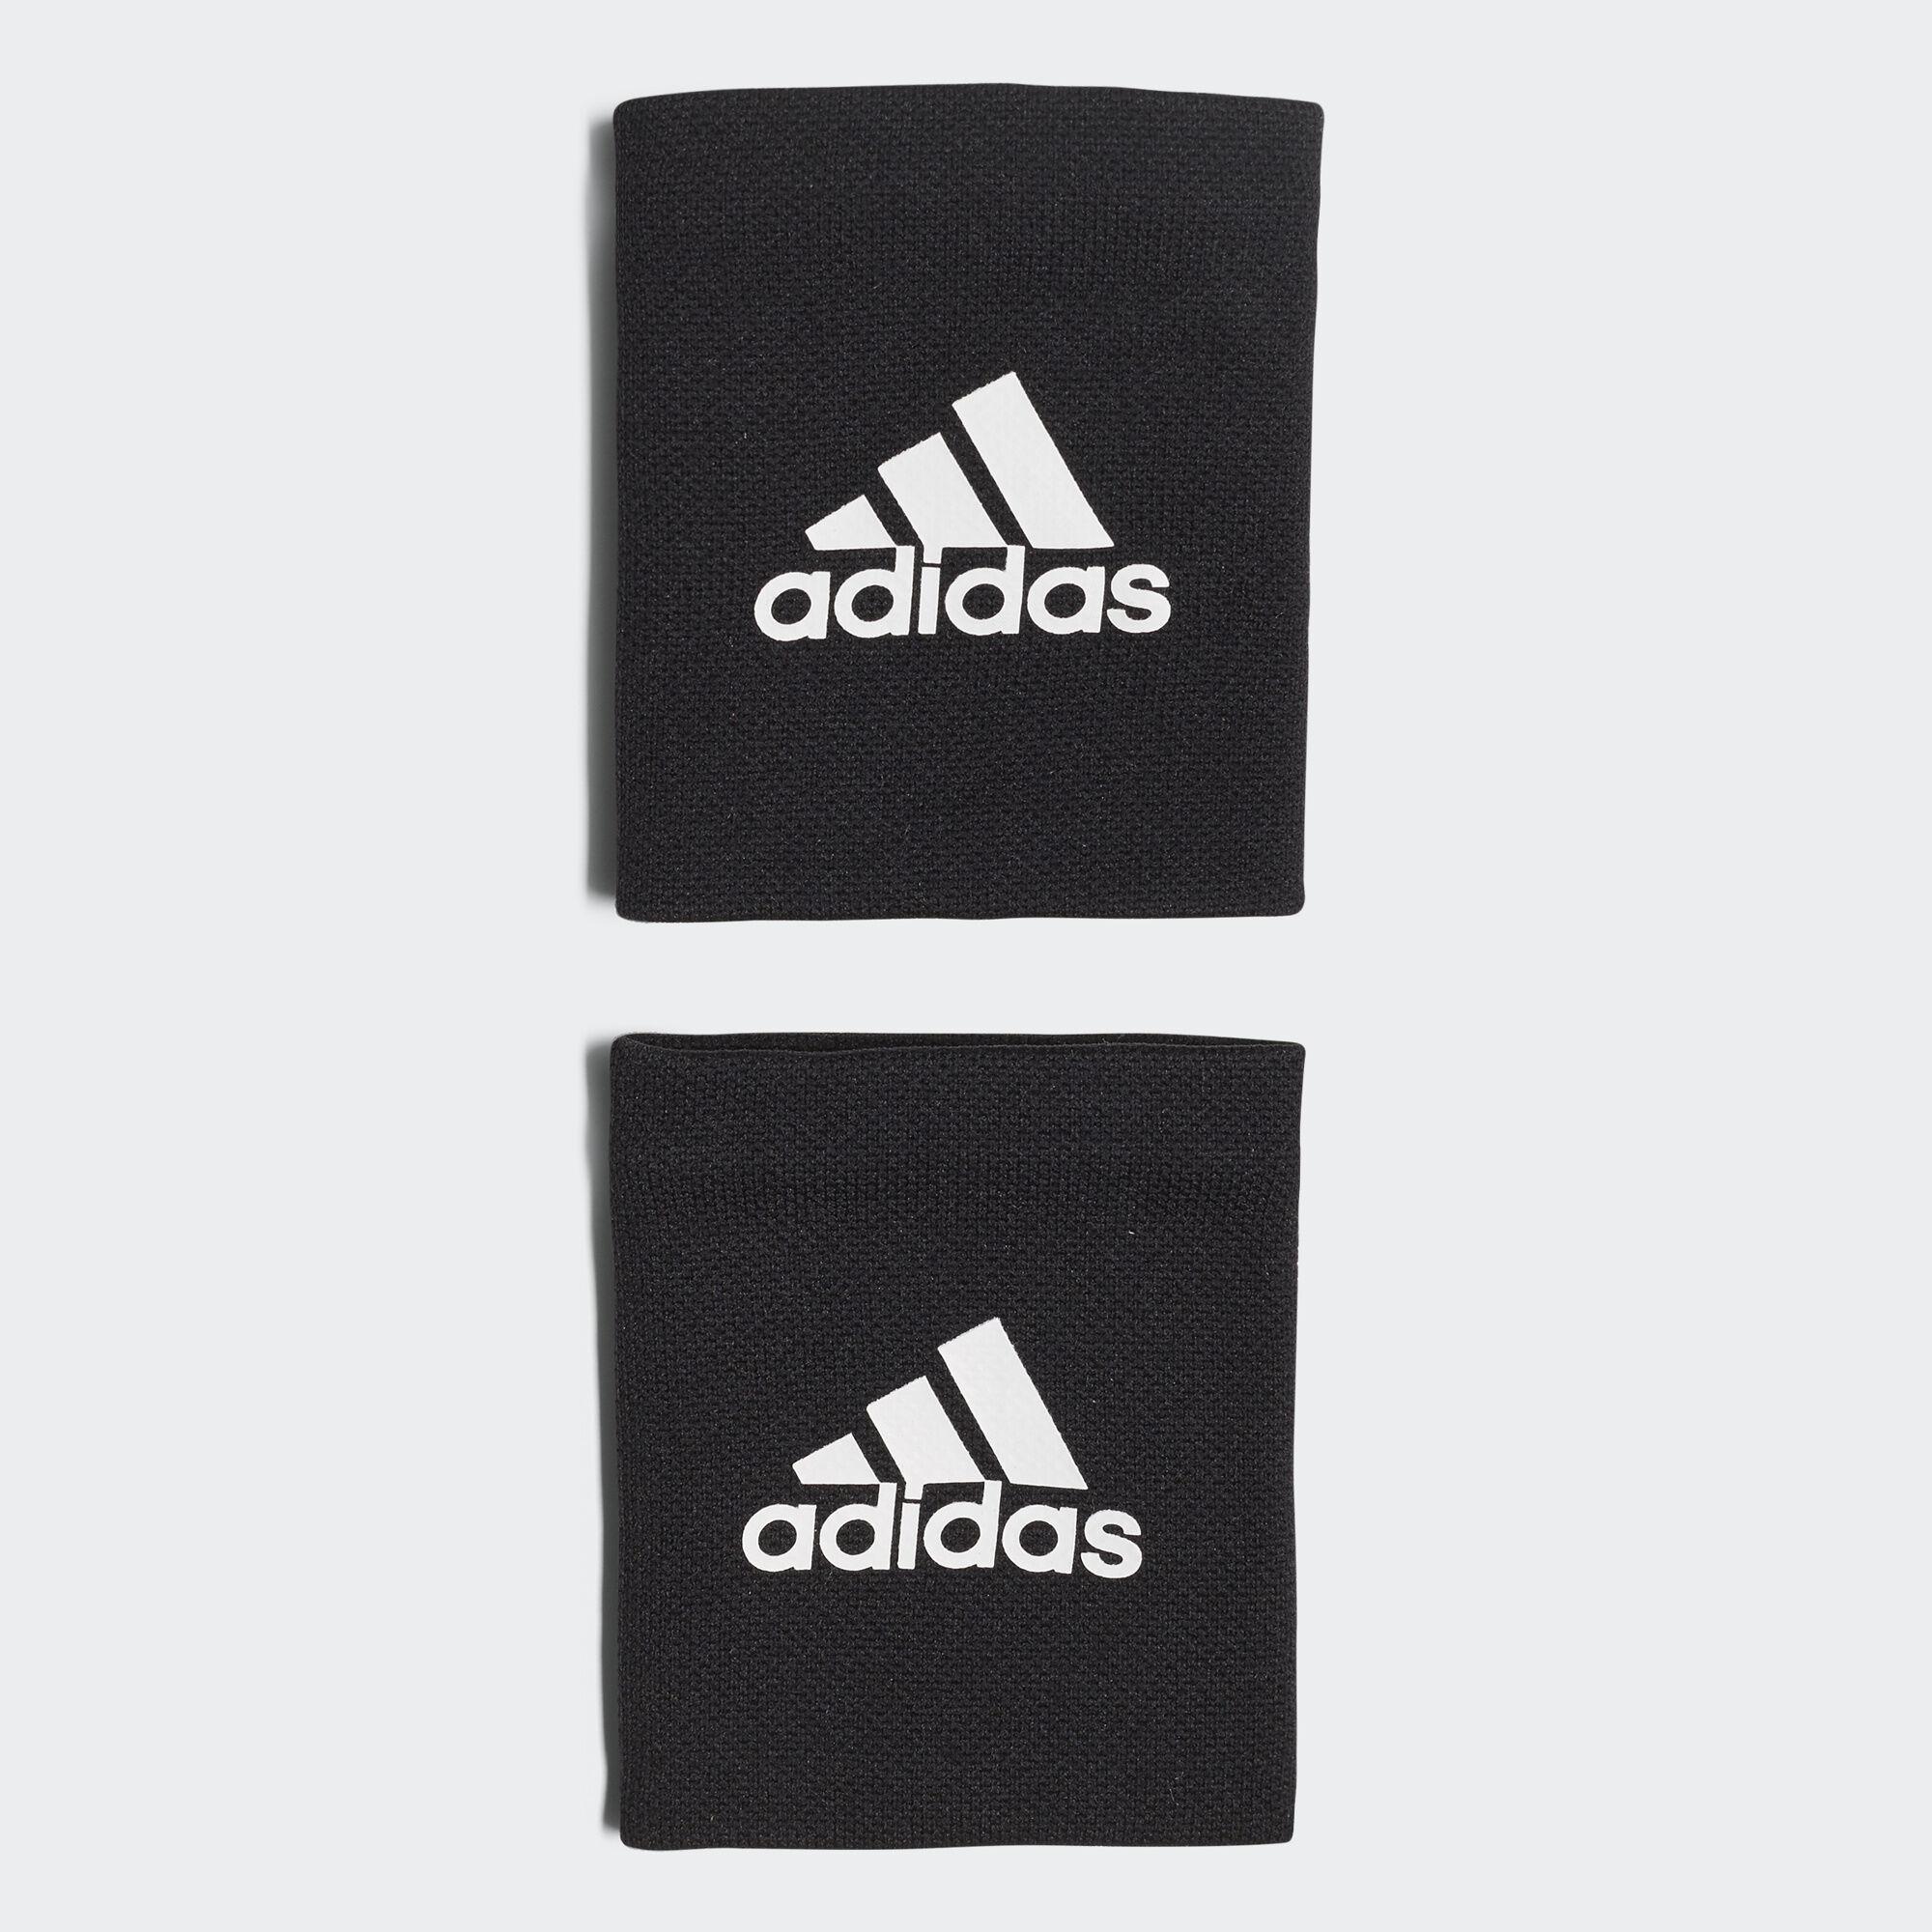 adidas gift card online uk